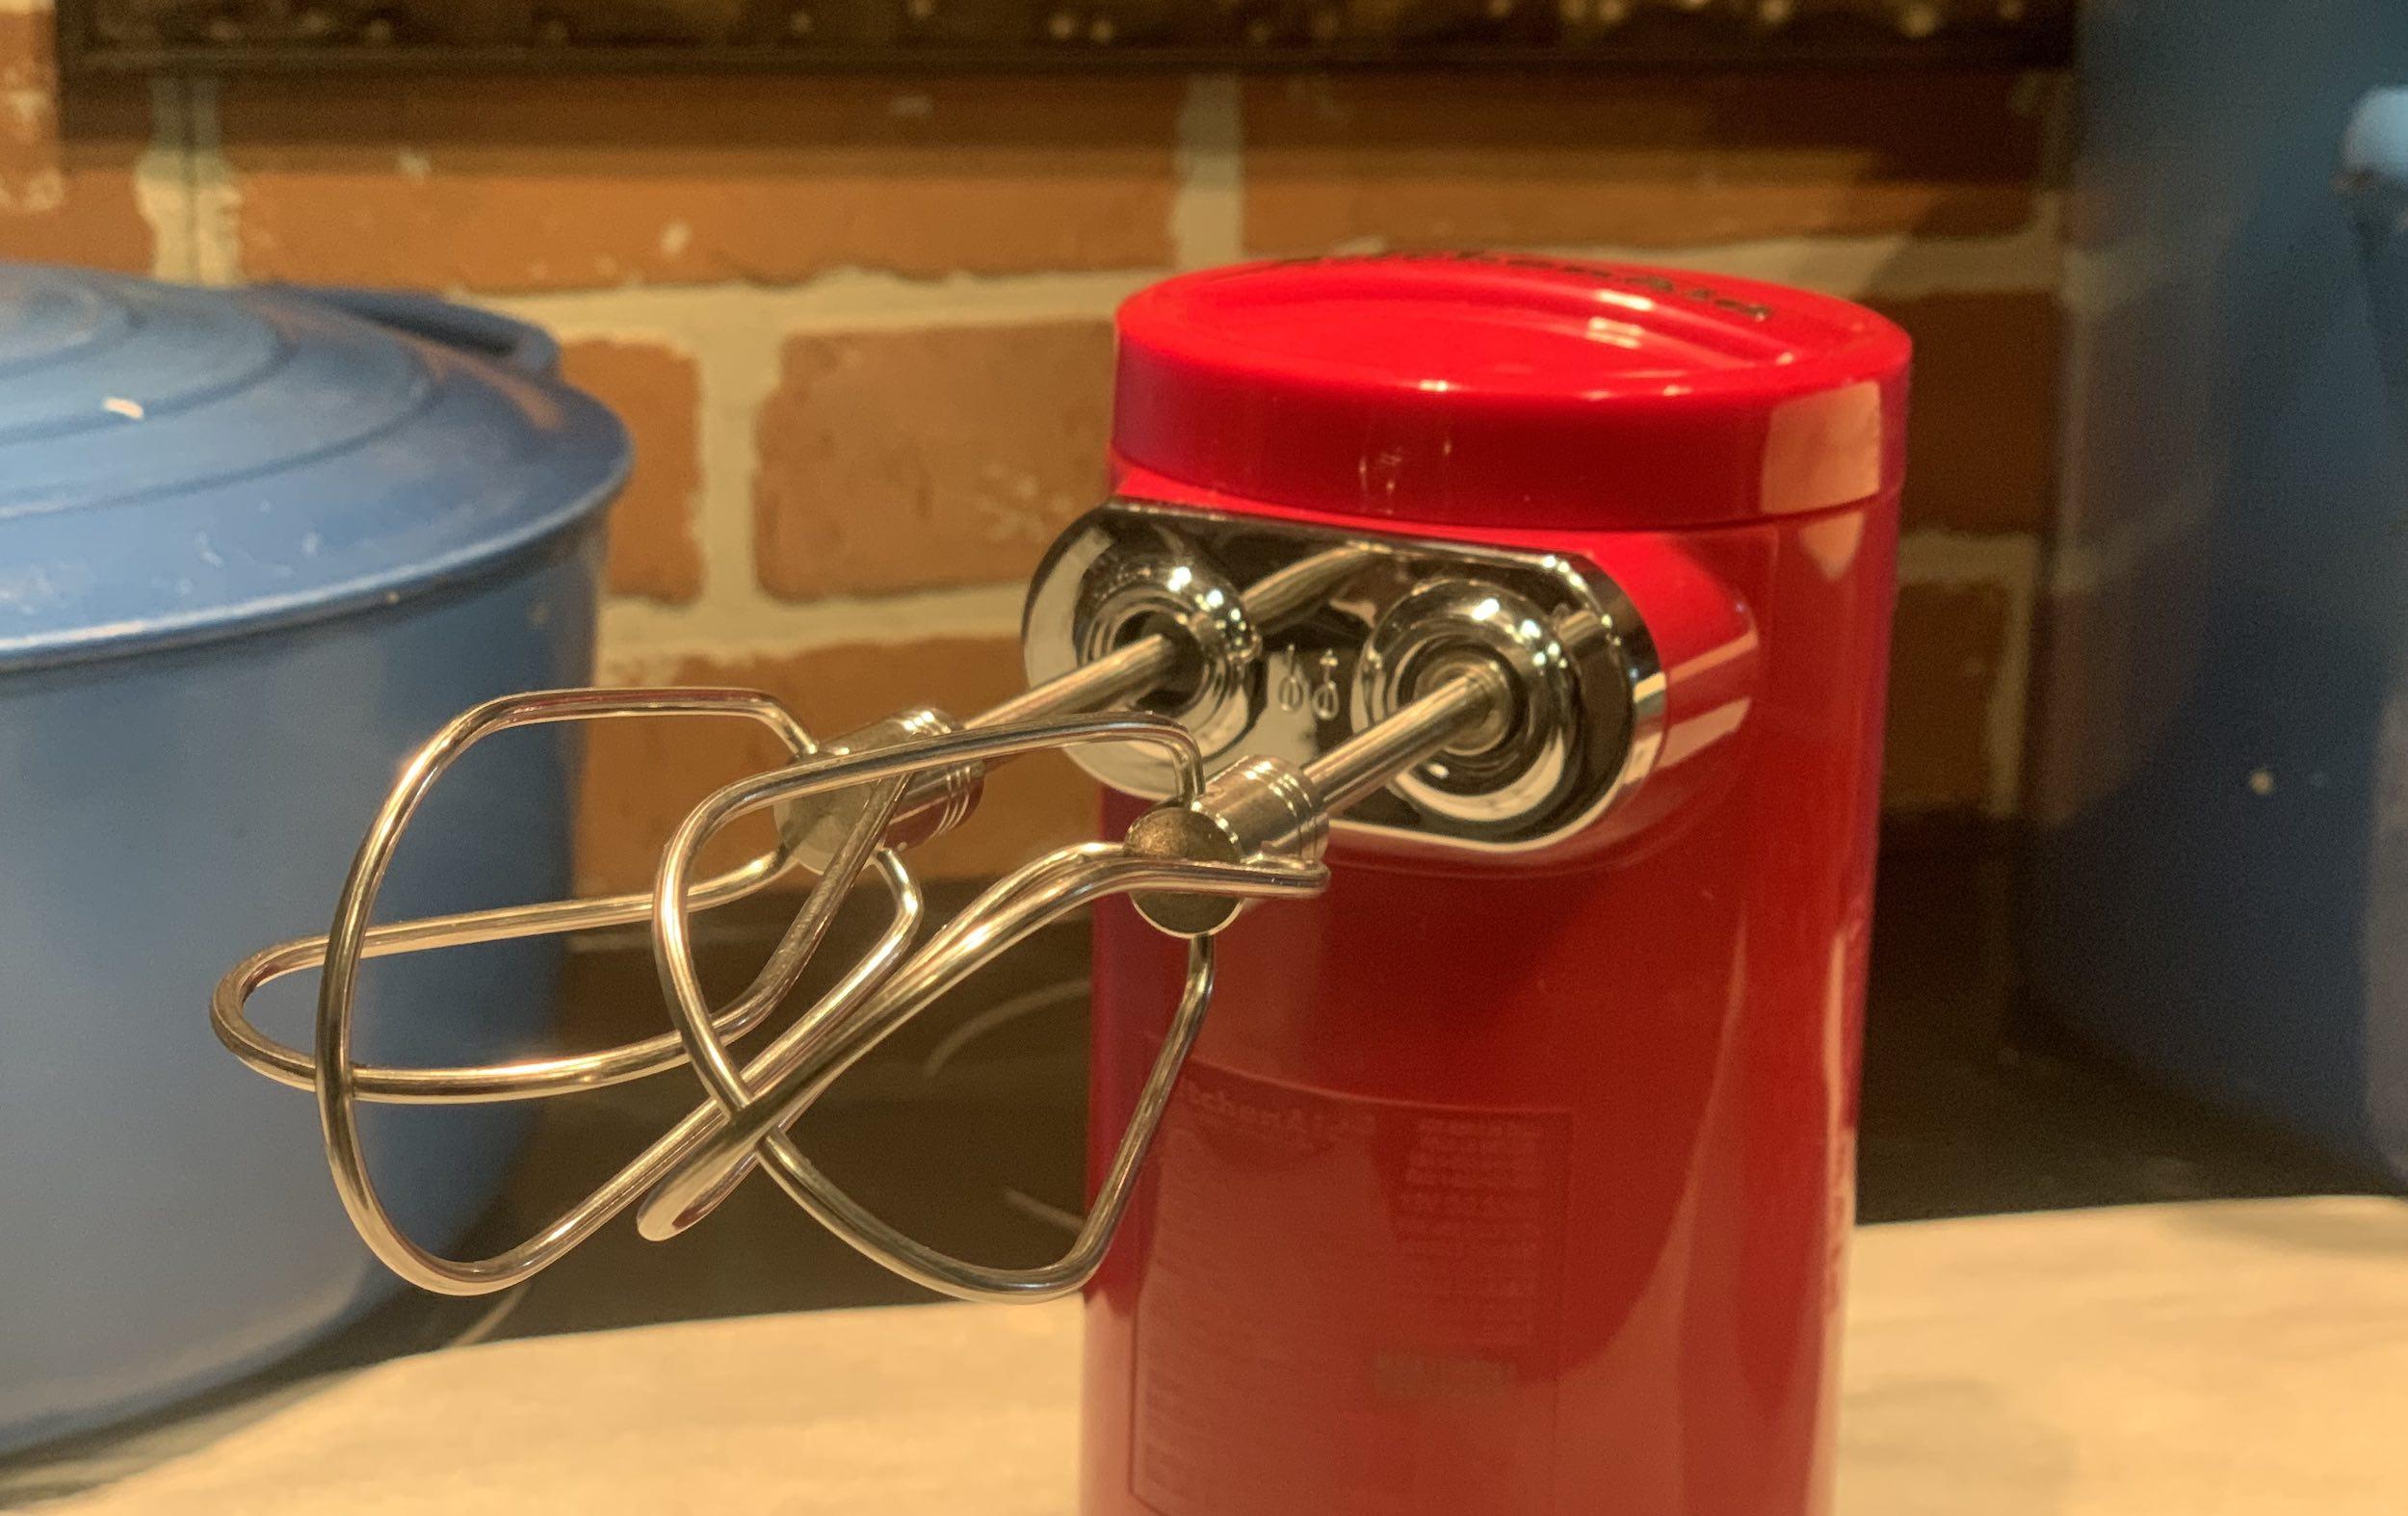 KitchenAid Cordless hand mixer beaters